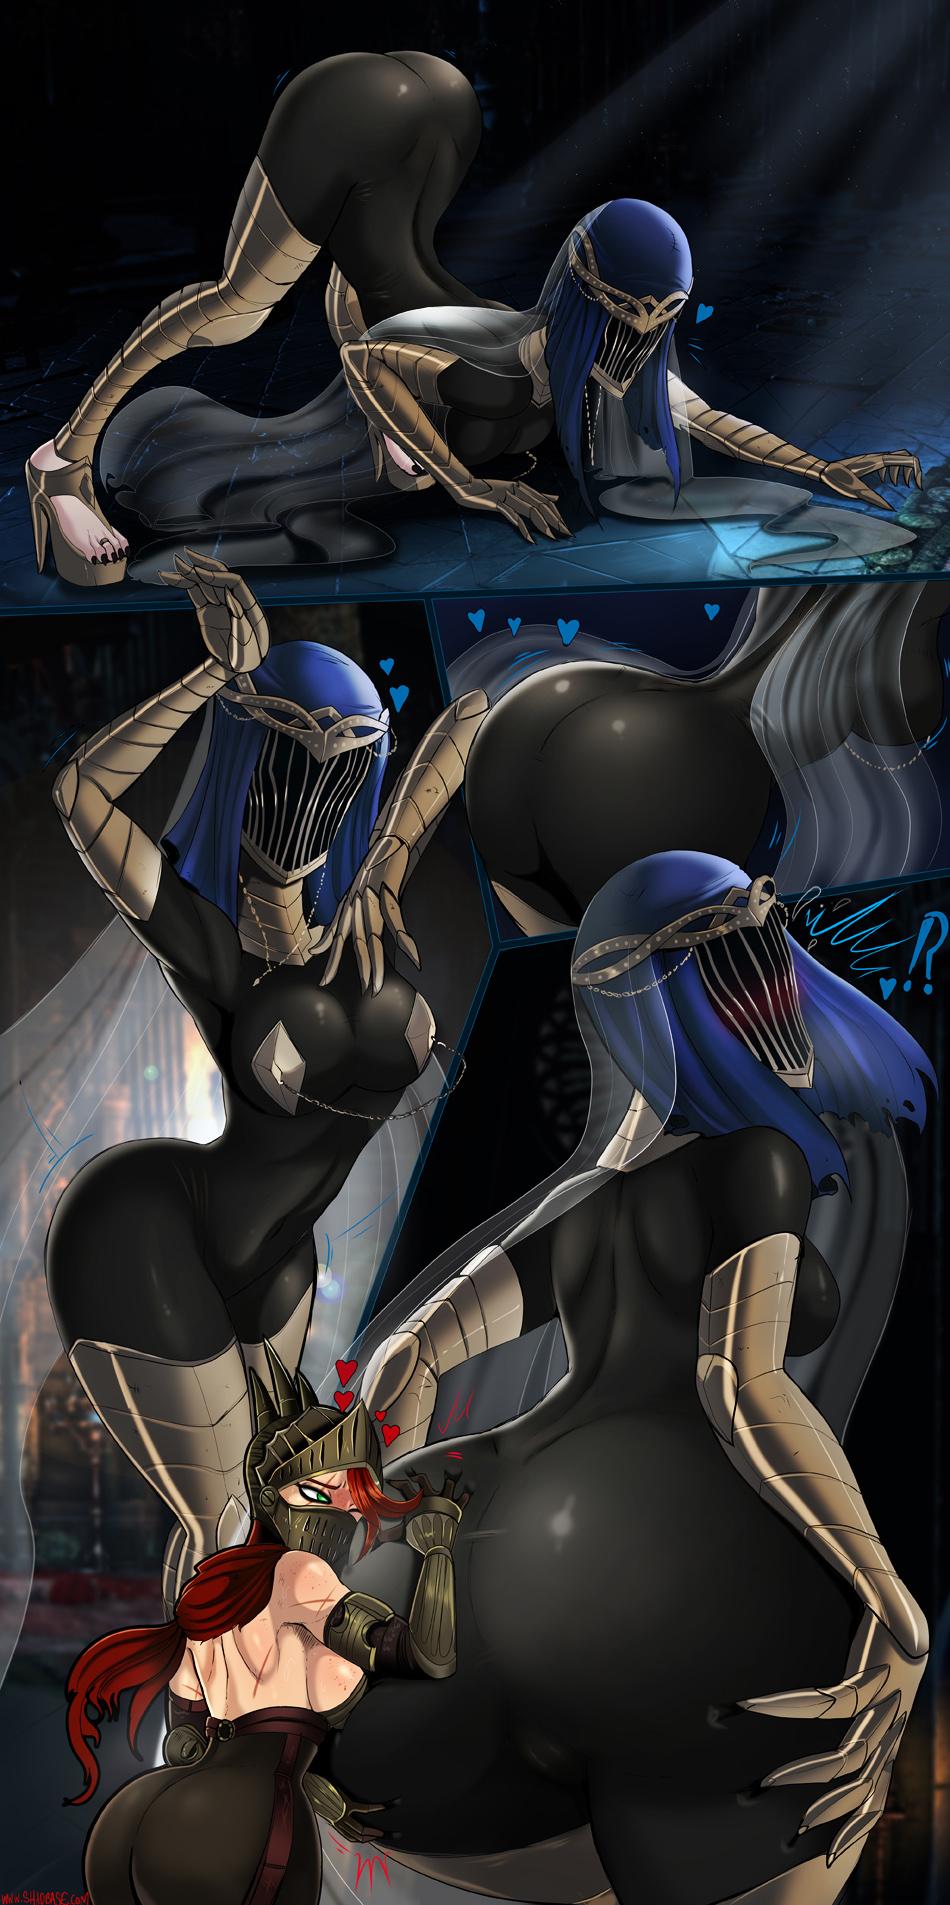 souls dancers dark armor 3 Shadow x maria the hedgehog